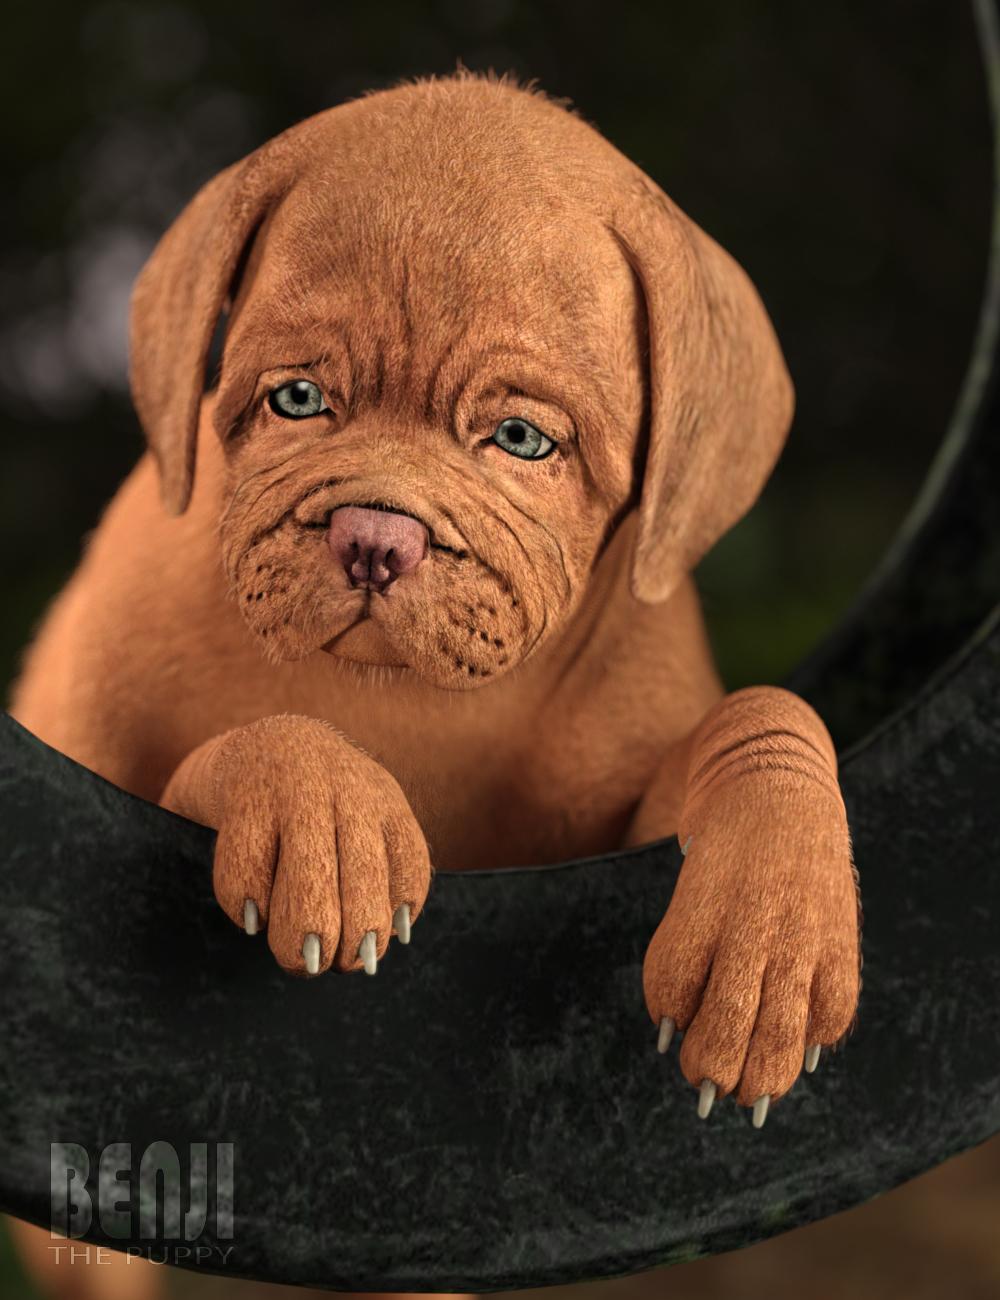 Benji The Puppy HD for Daz Dog 8 by: Deepsea, 3D Models by Daz 3D